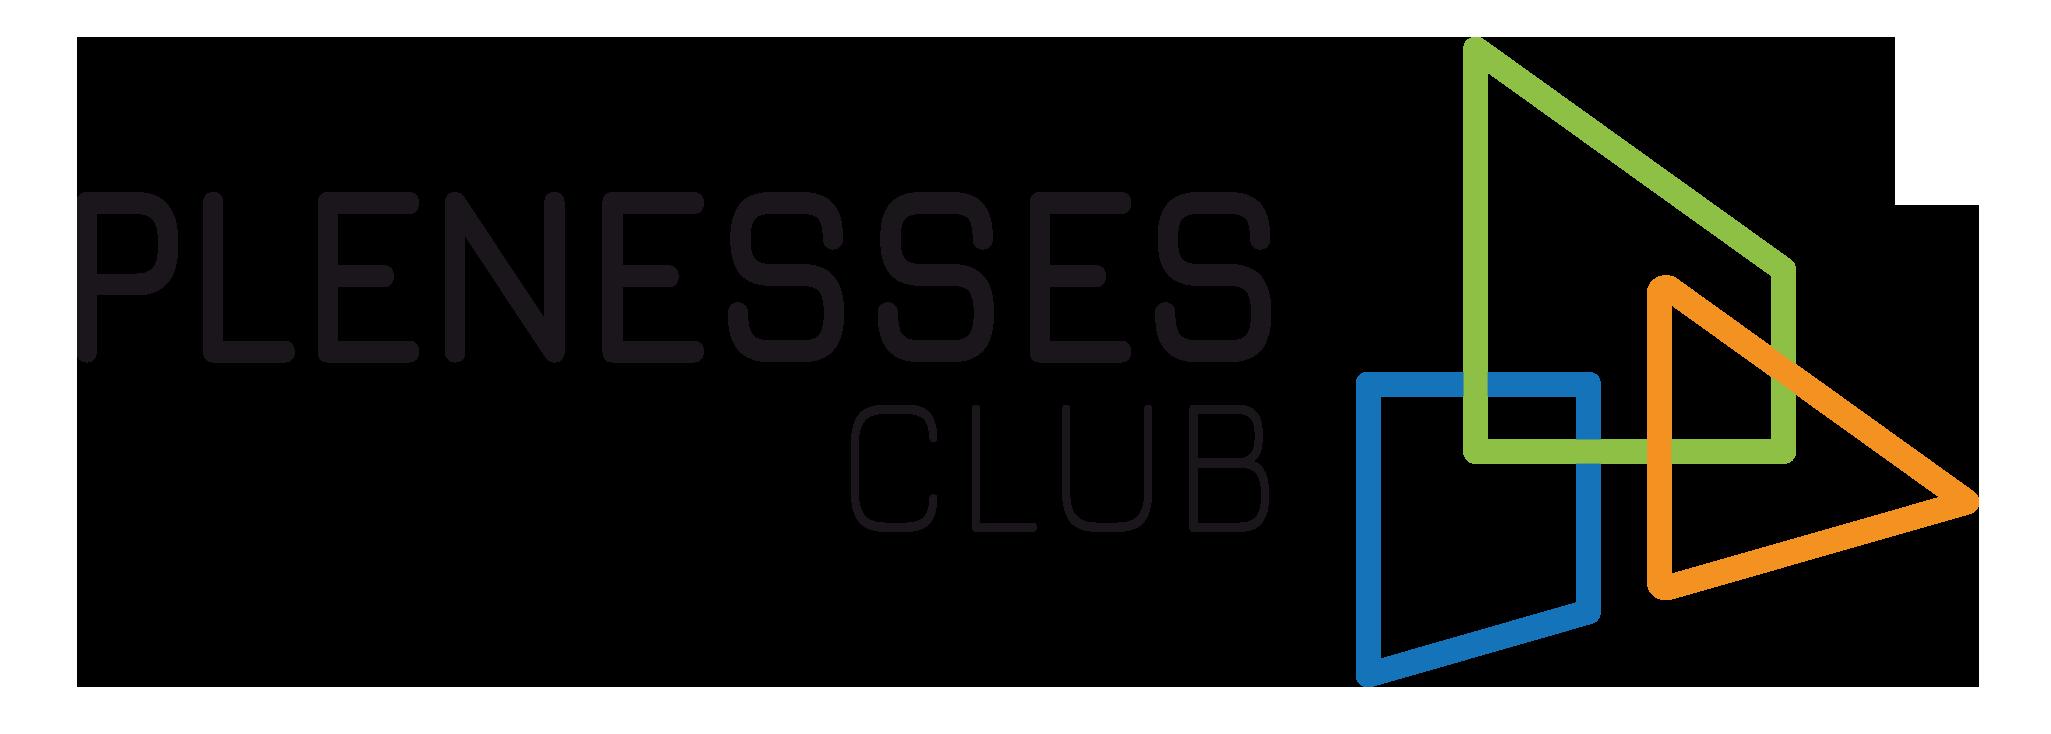 Plenesses Club